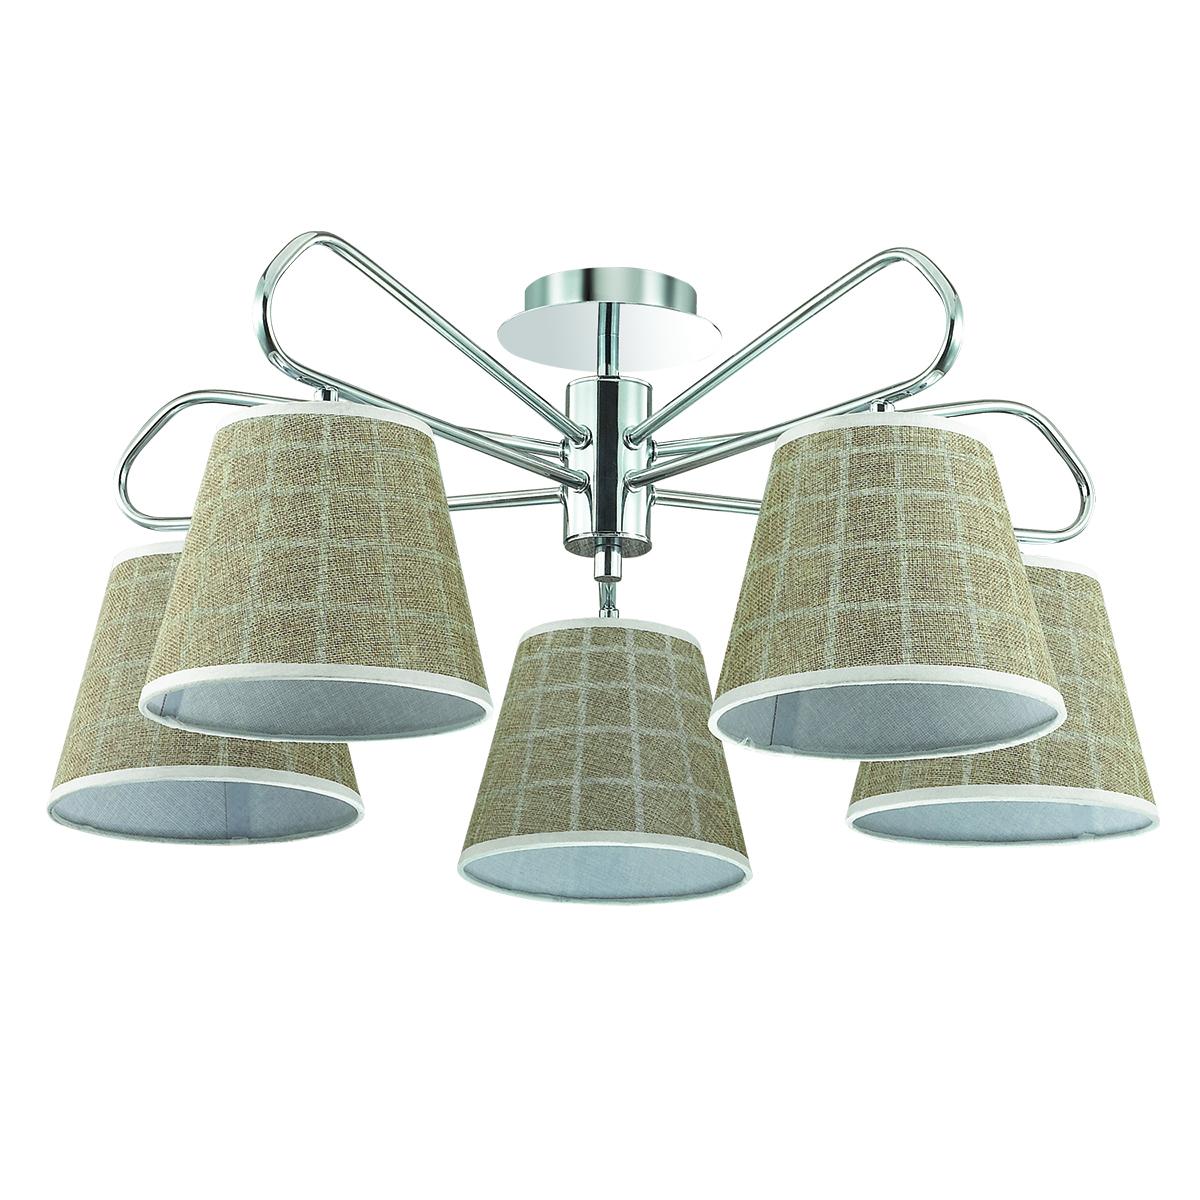 Потолочная люстра Lumion Graziana 3499/5, 5xE14x40W, хром, белый, коричневый, металл, текстиль - фото 2